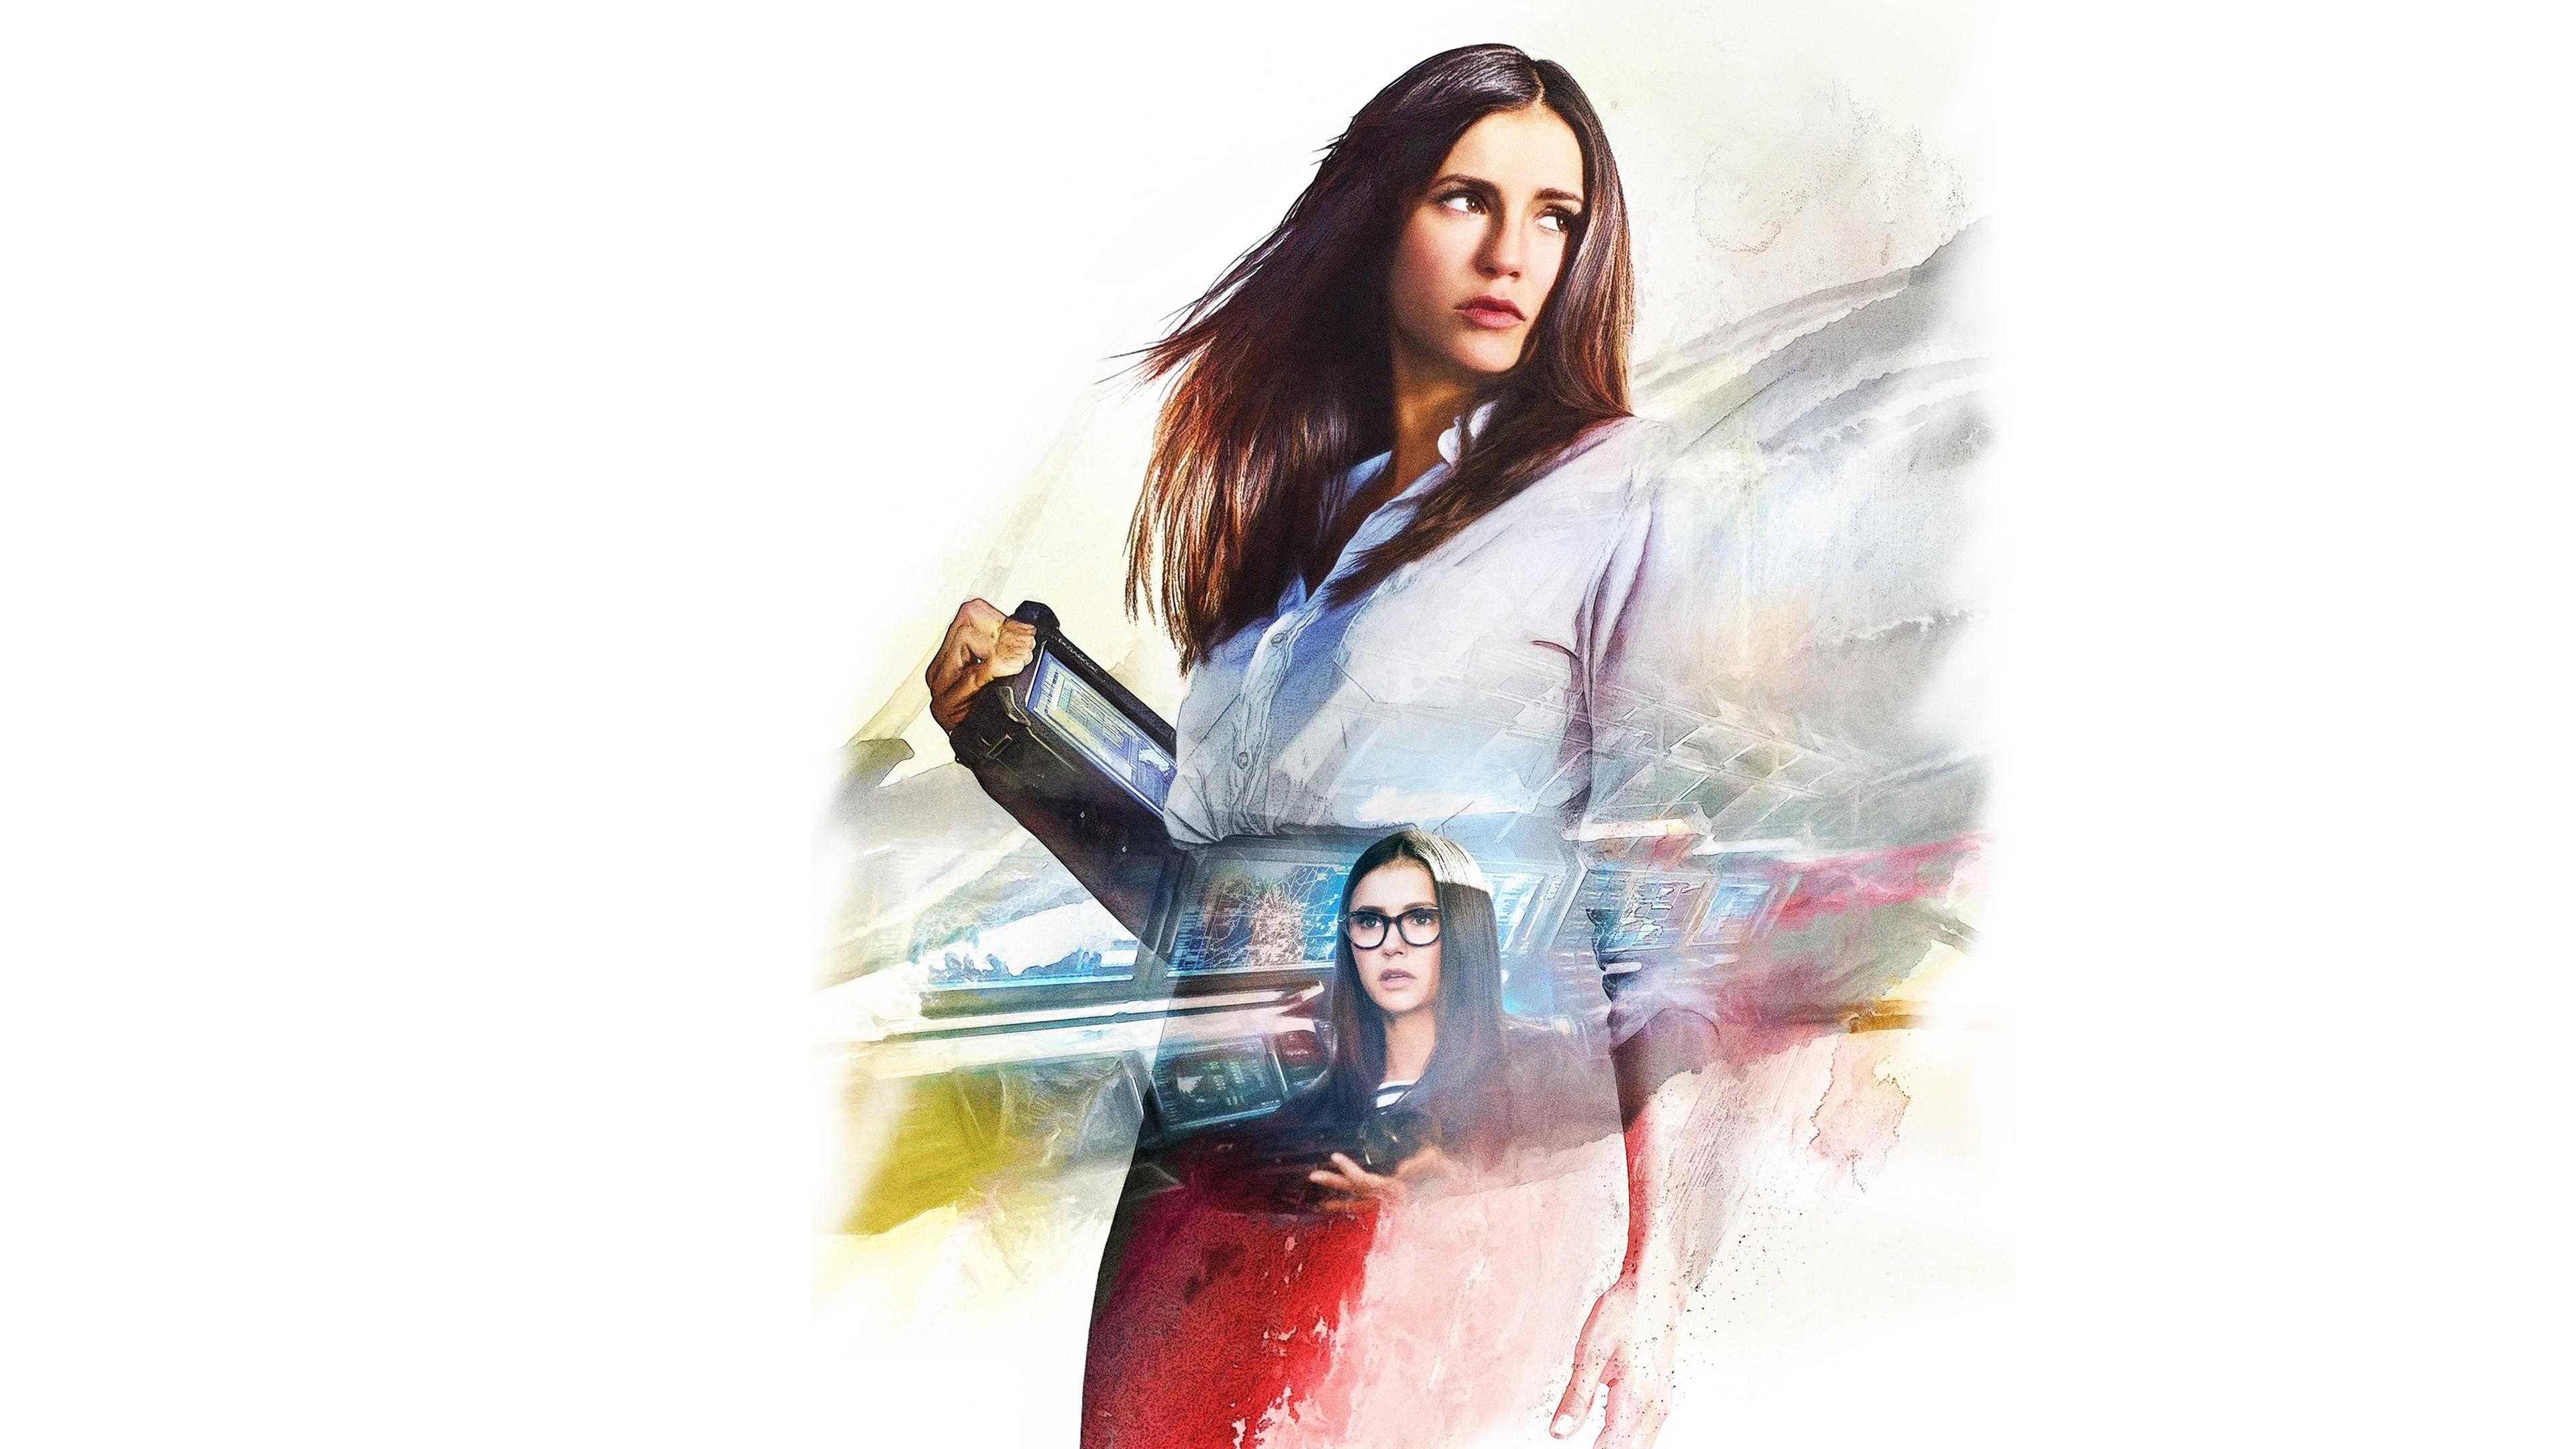 Wallpaper Xxx Return Of Xander Cage Nina Dobrev Best